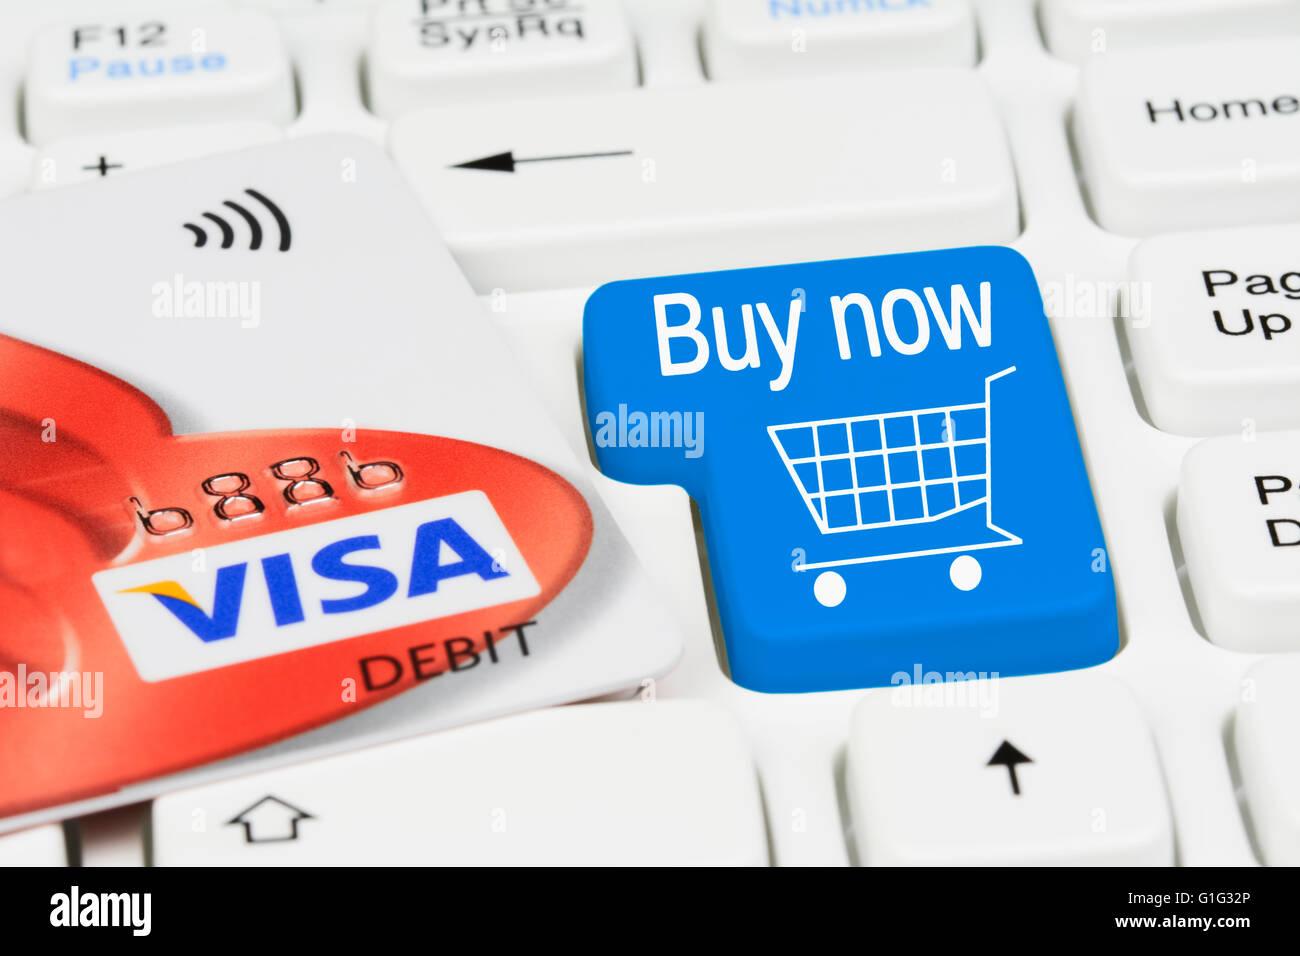 Online-Shopping. Online-shopping-Taste auf einem Computer keyboard.with Visa-Debitkarte. Stockbild